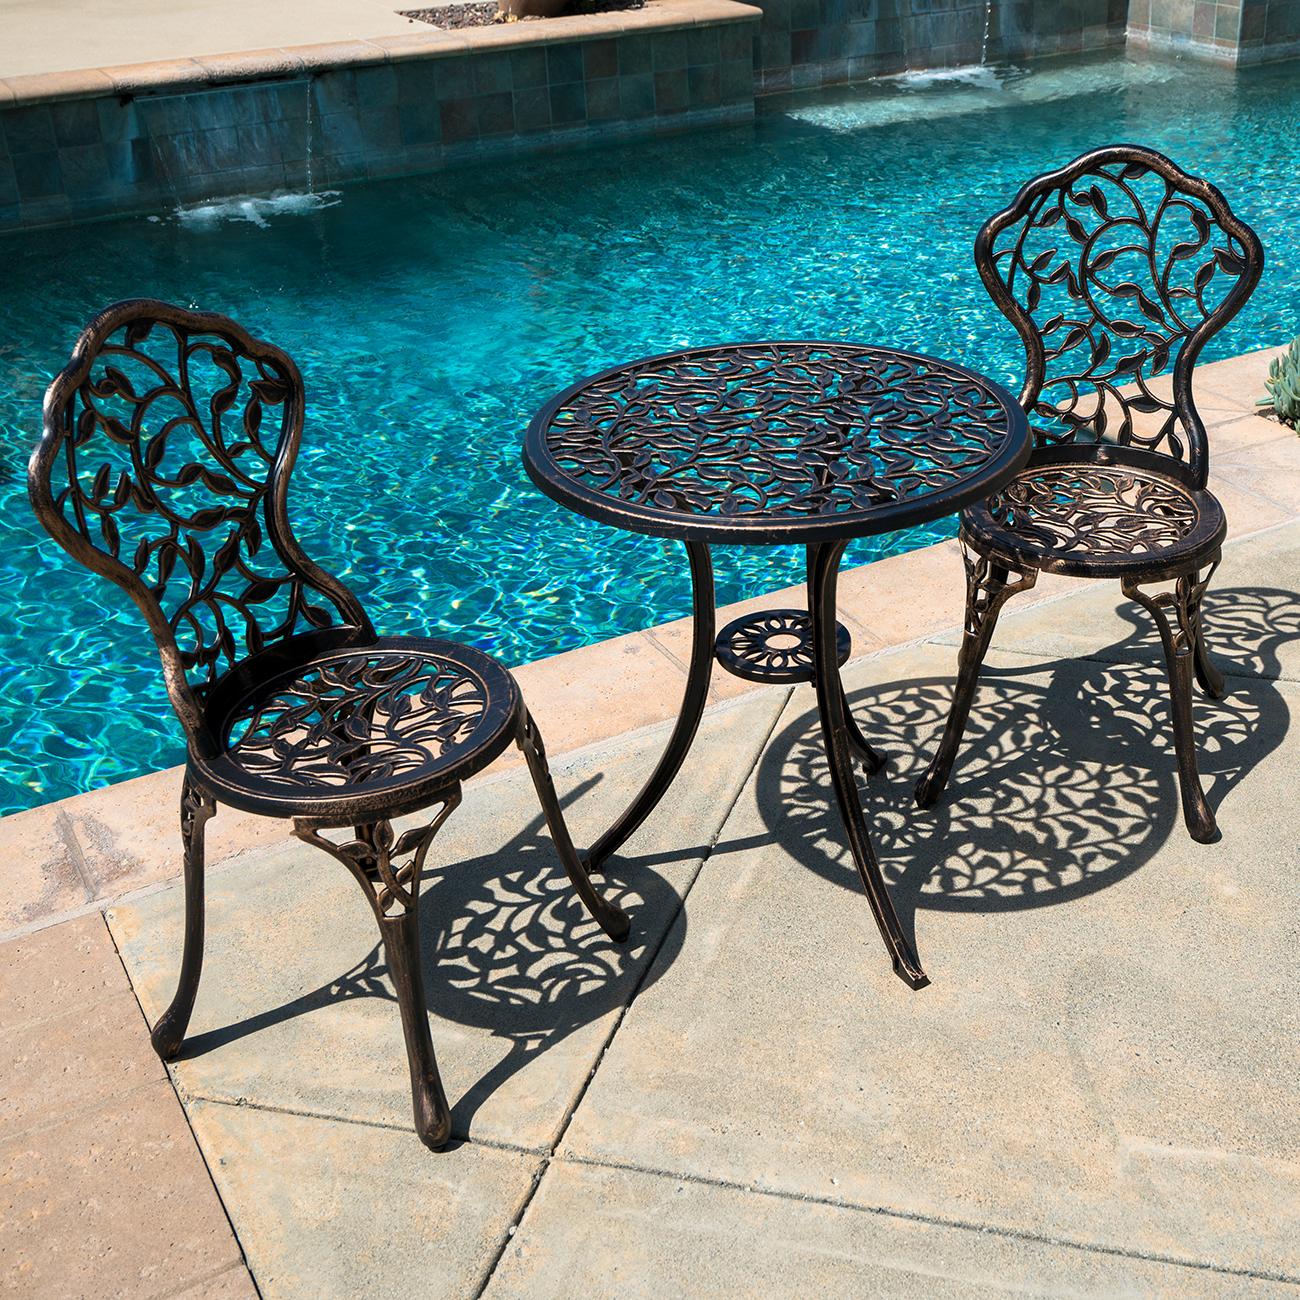 Sensational Details About 3Pc Bistro Set In Antique Outdoor Patio Furniture Leaf Design Cast Aluminum New Download Free Architecture Designs Embacsunscenecom